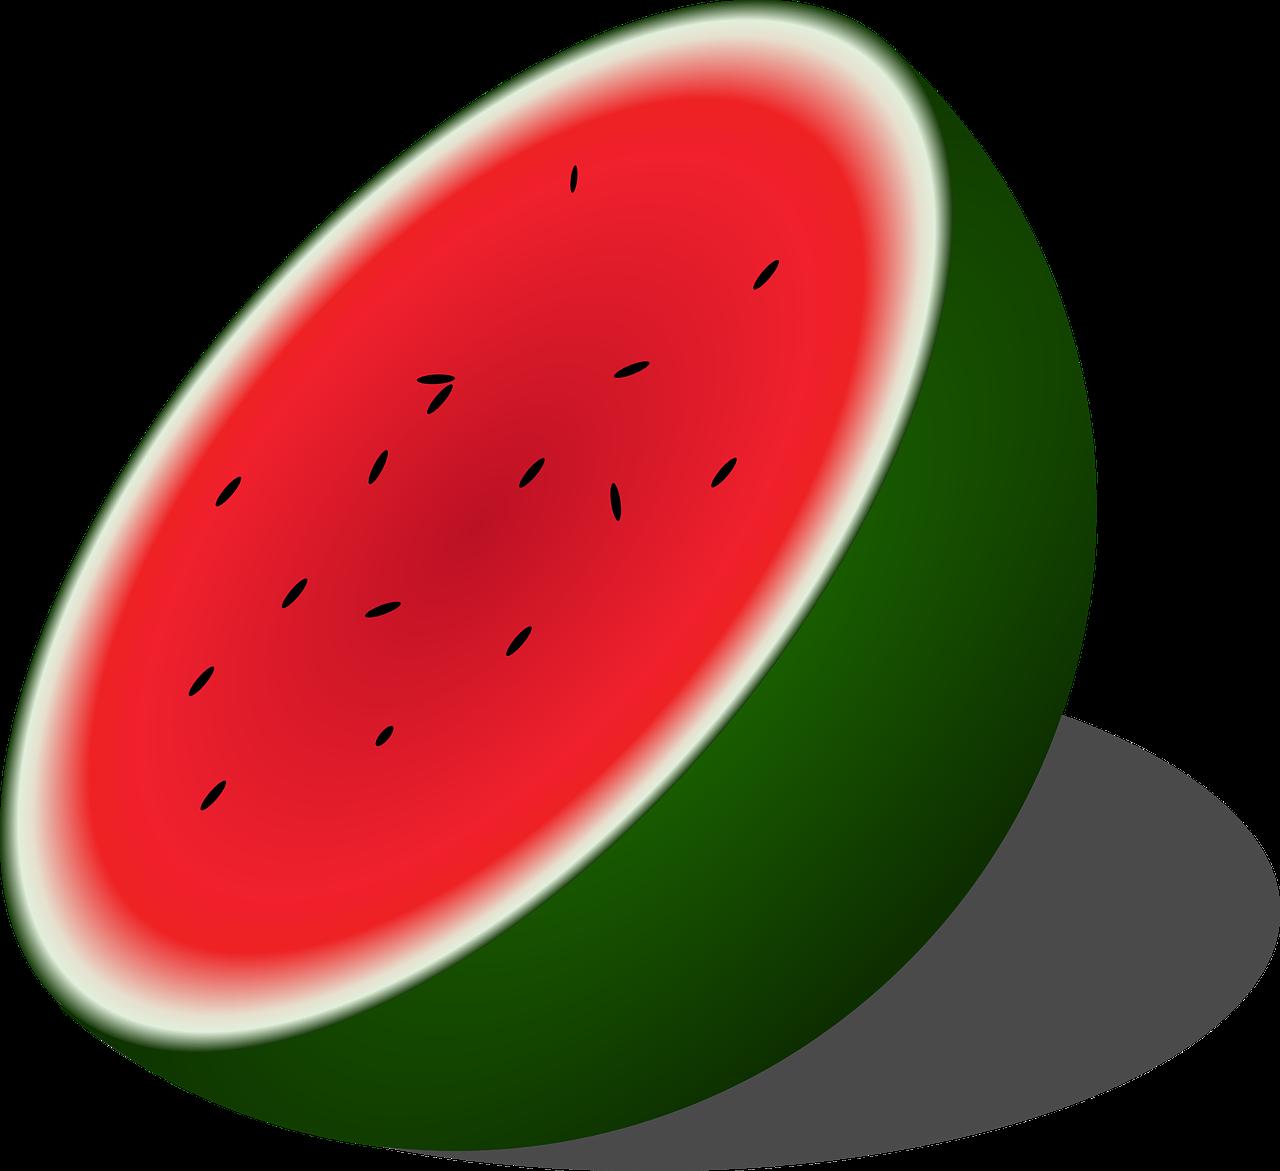 Watermelon clipart sweet fruit. Melon half seeded free